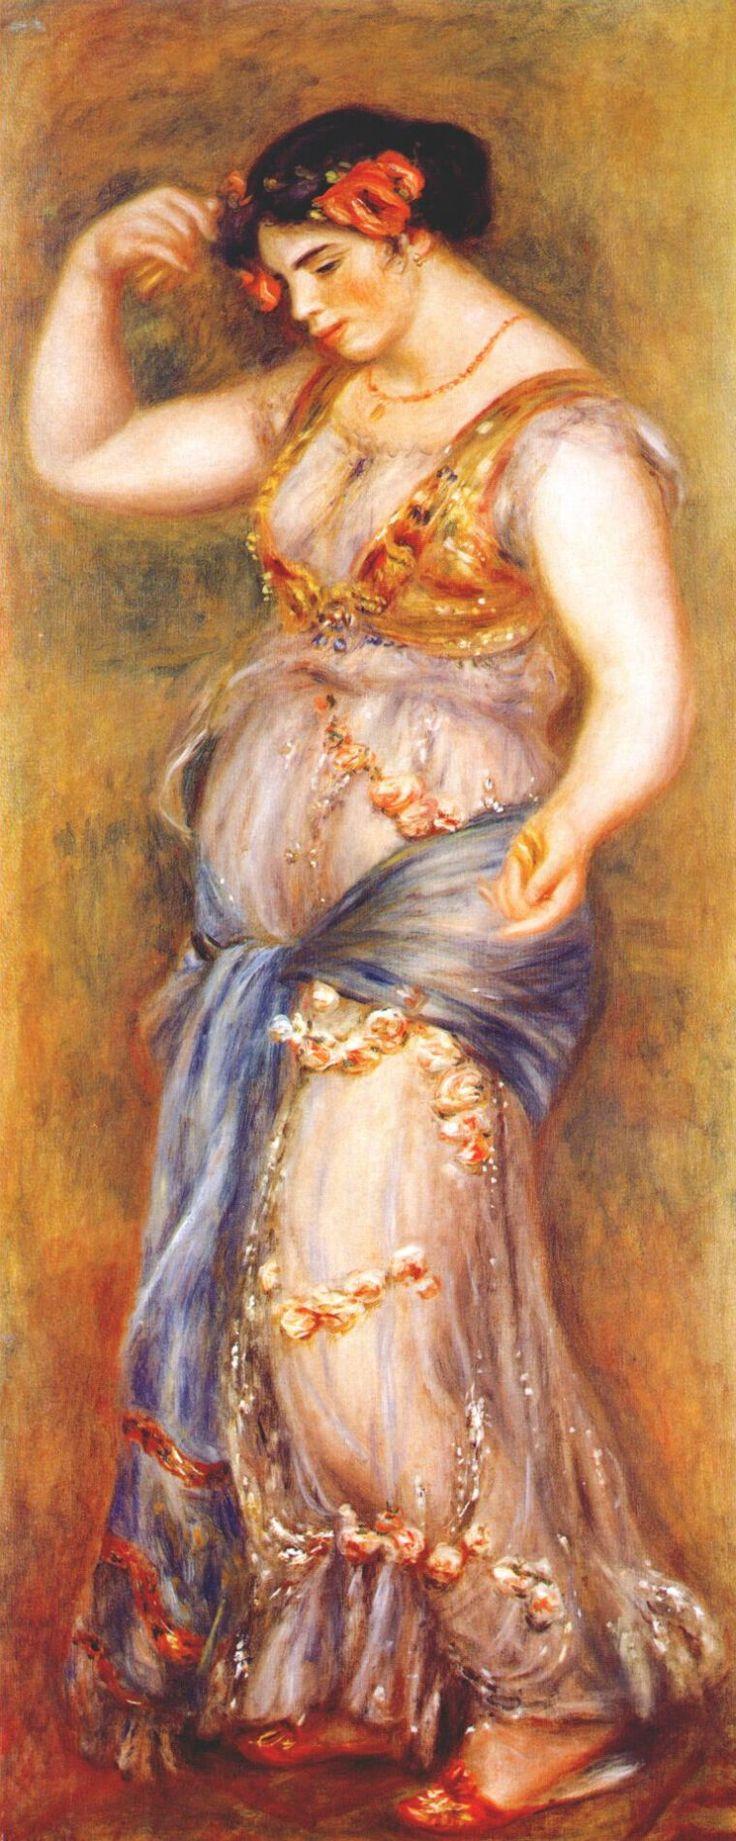 Dancer with Castanettes - Renoir Pierre-Auguste